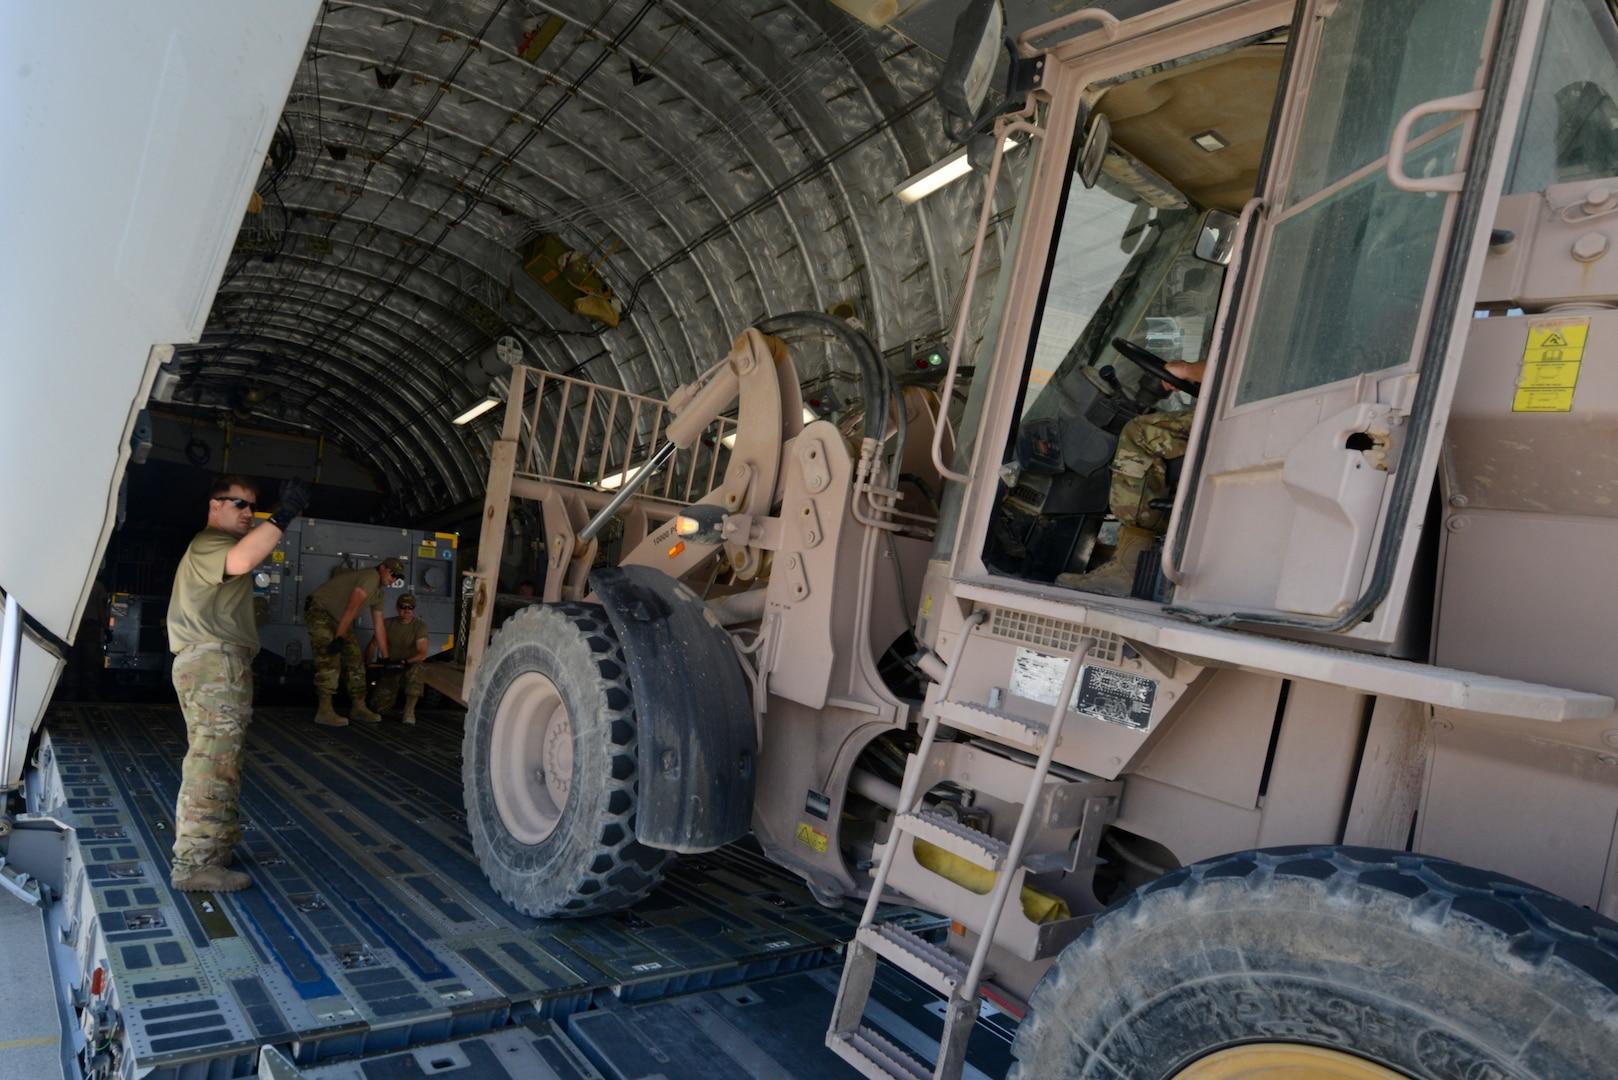 Airmen transporting gear.